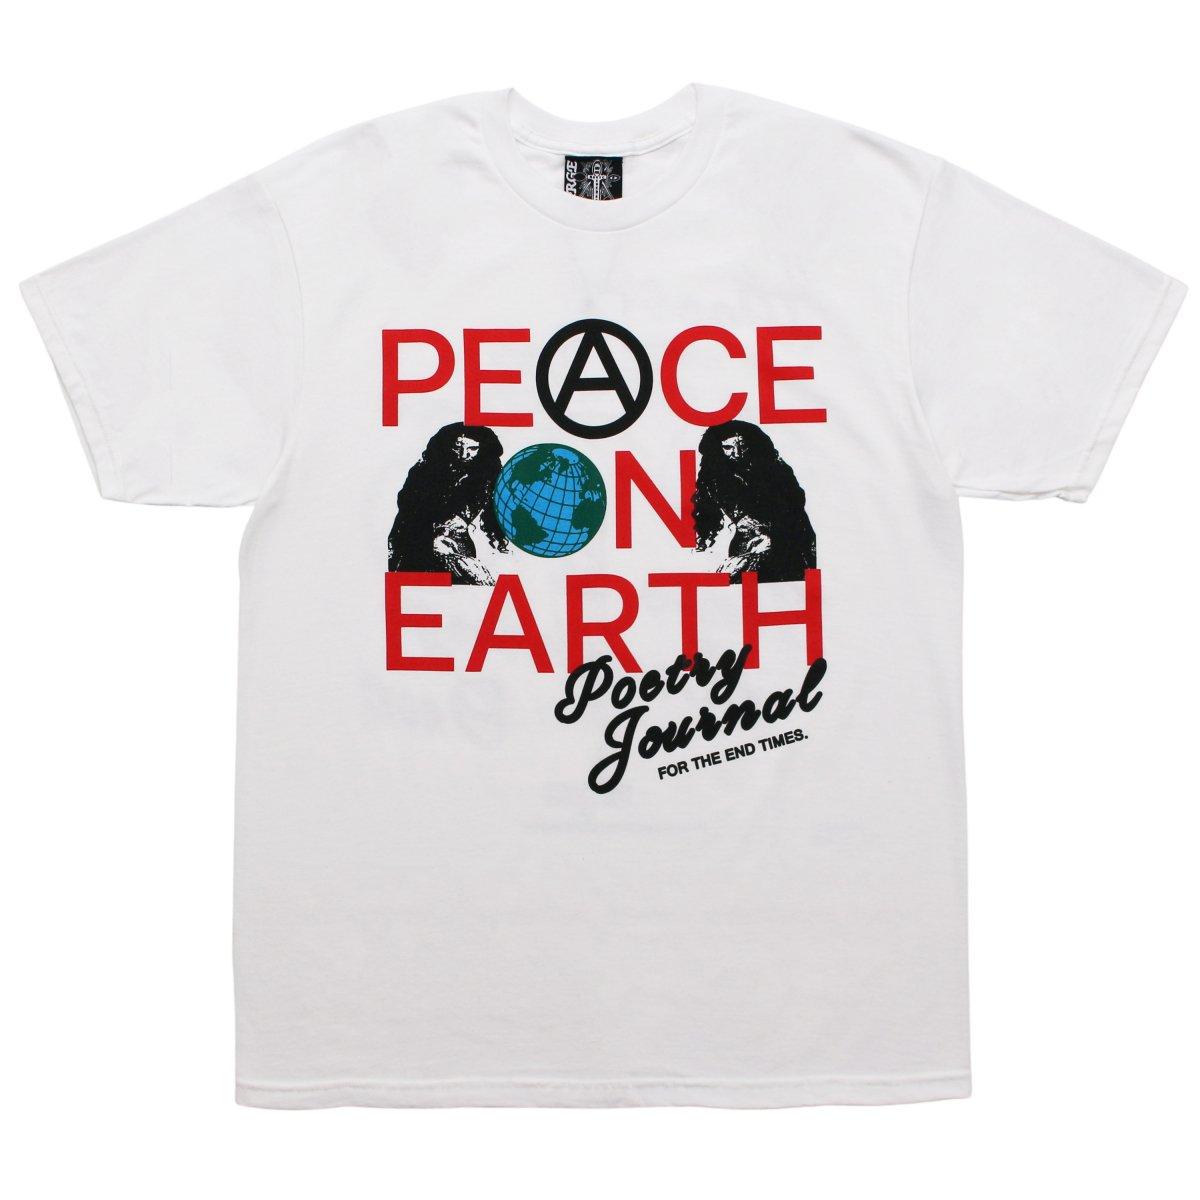 PEACE ON EARTH #01 SHIRT